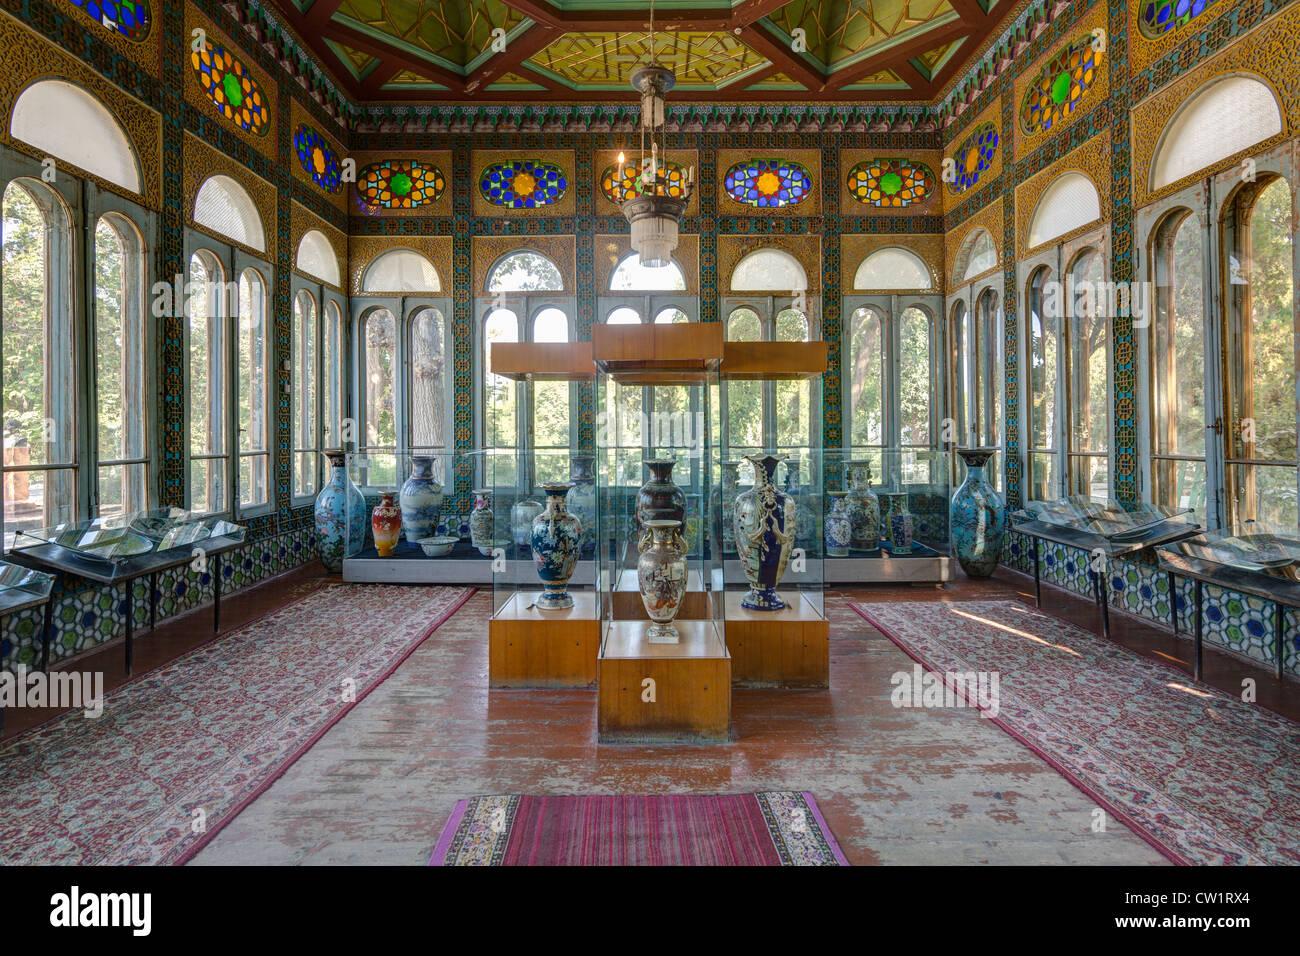 Innenraum des Pavillons, Sitarah-i Mahi Amirs Sommerpalast, Buchara Usbekistan Stockbild